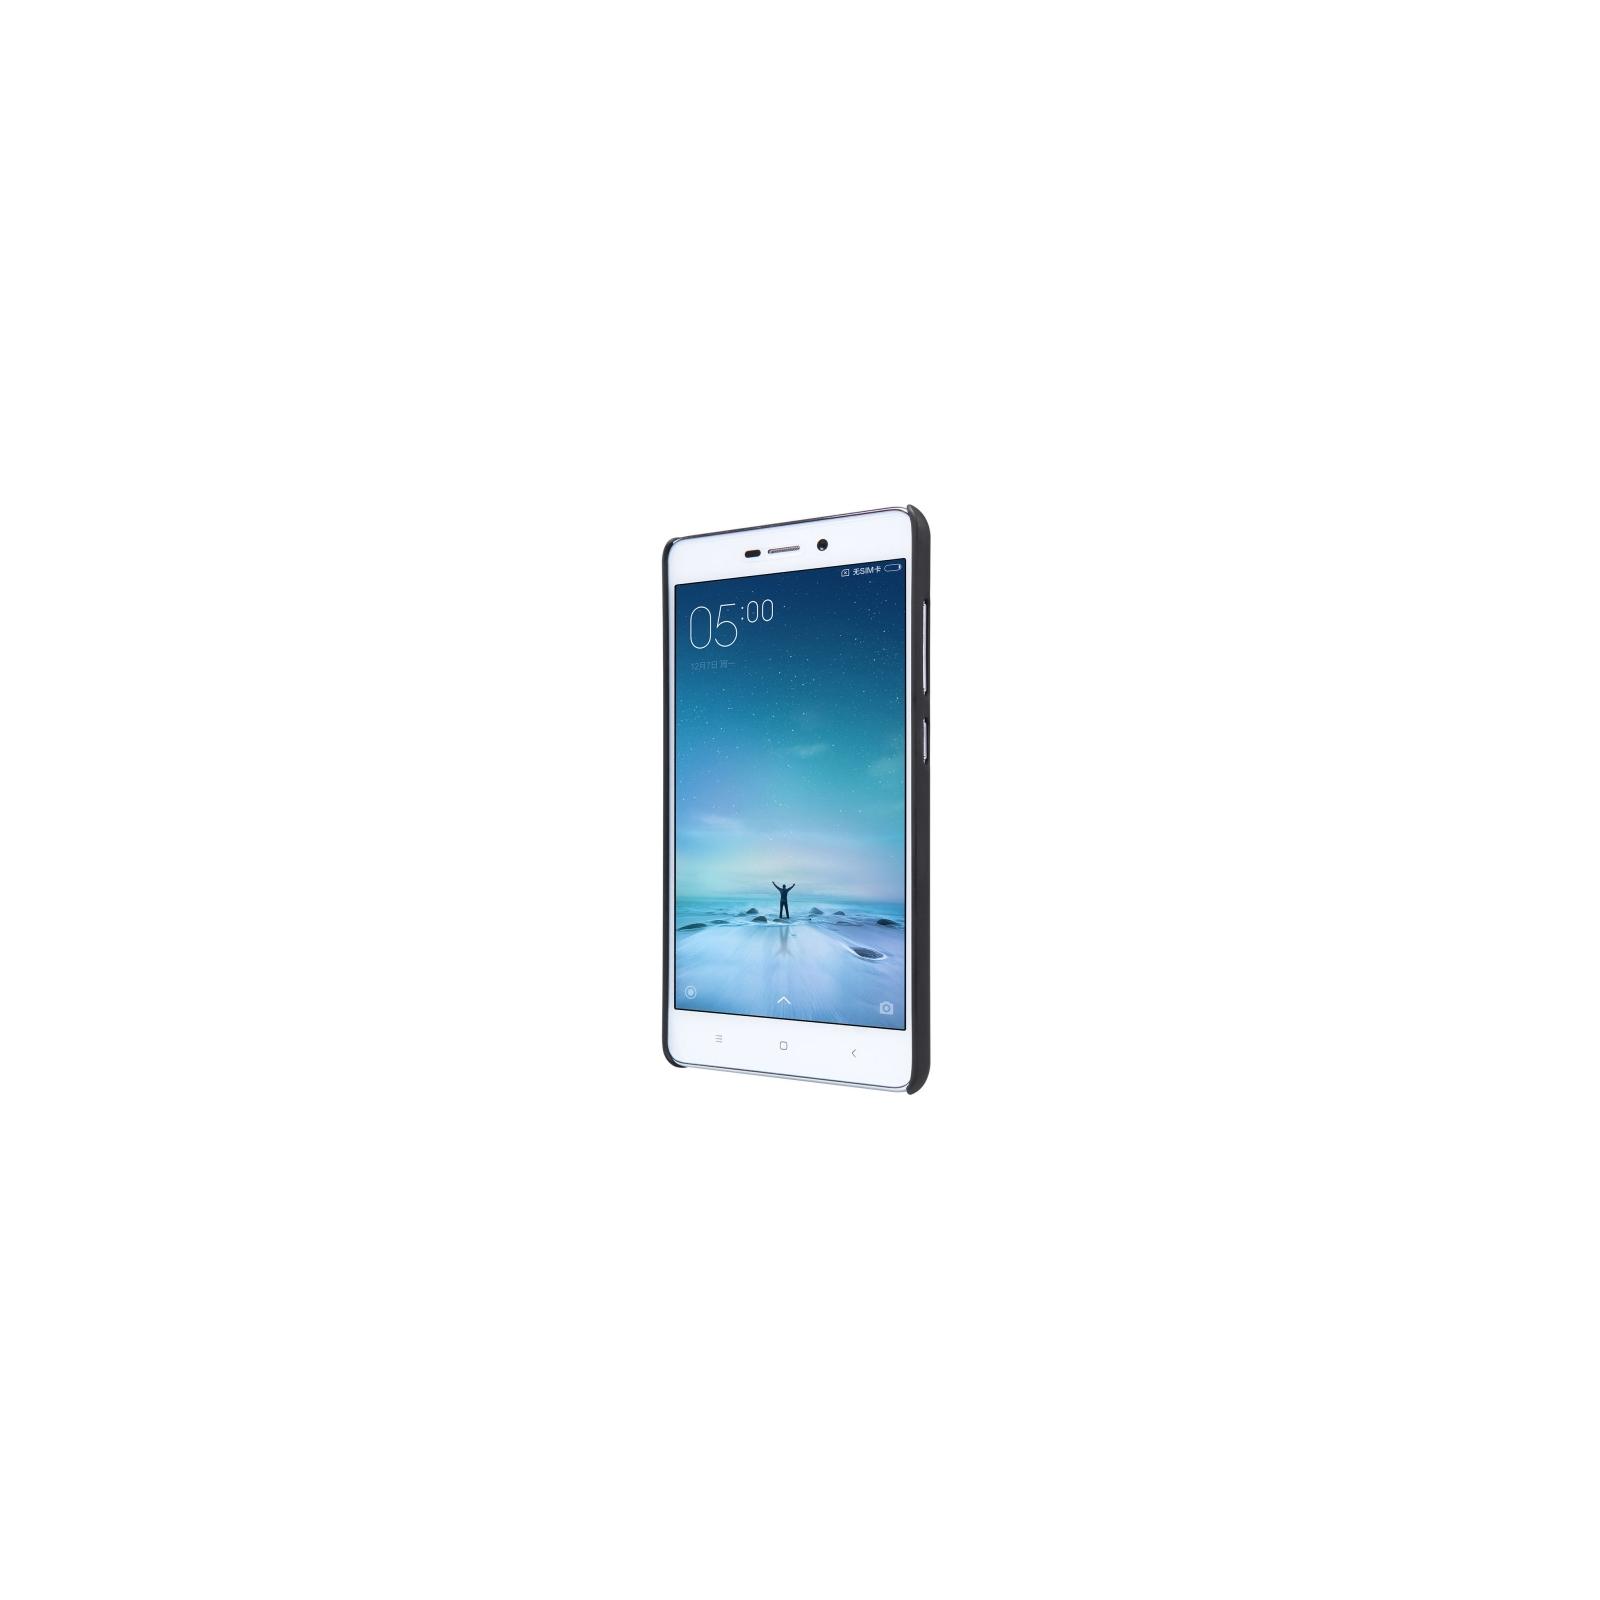 Чехол для моб. телефона NILLKIN для Xiaomi Redmi3 - Super Frosted Shield (Black) (6274141) изображение 4